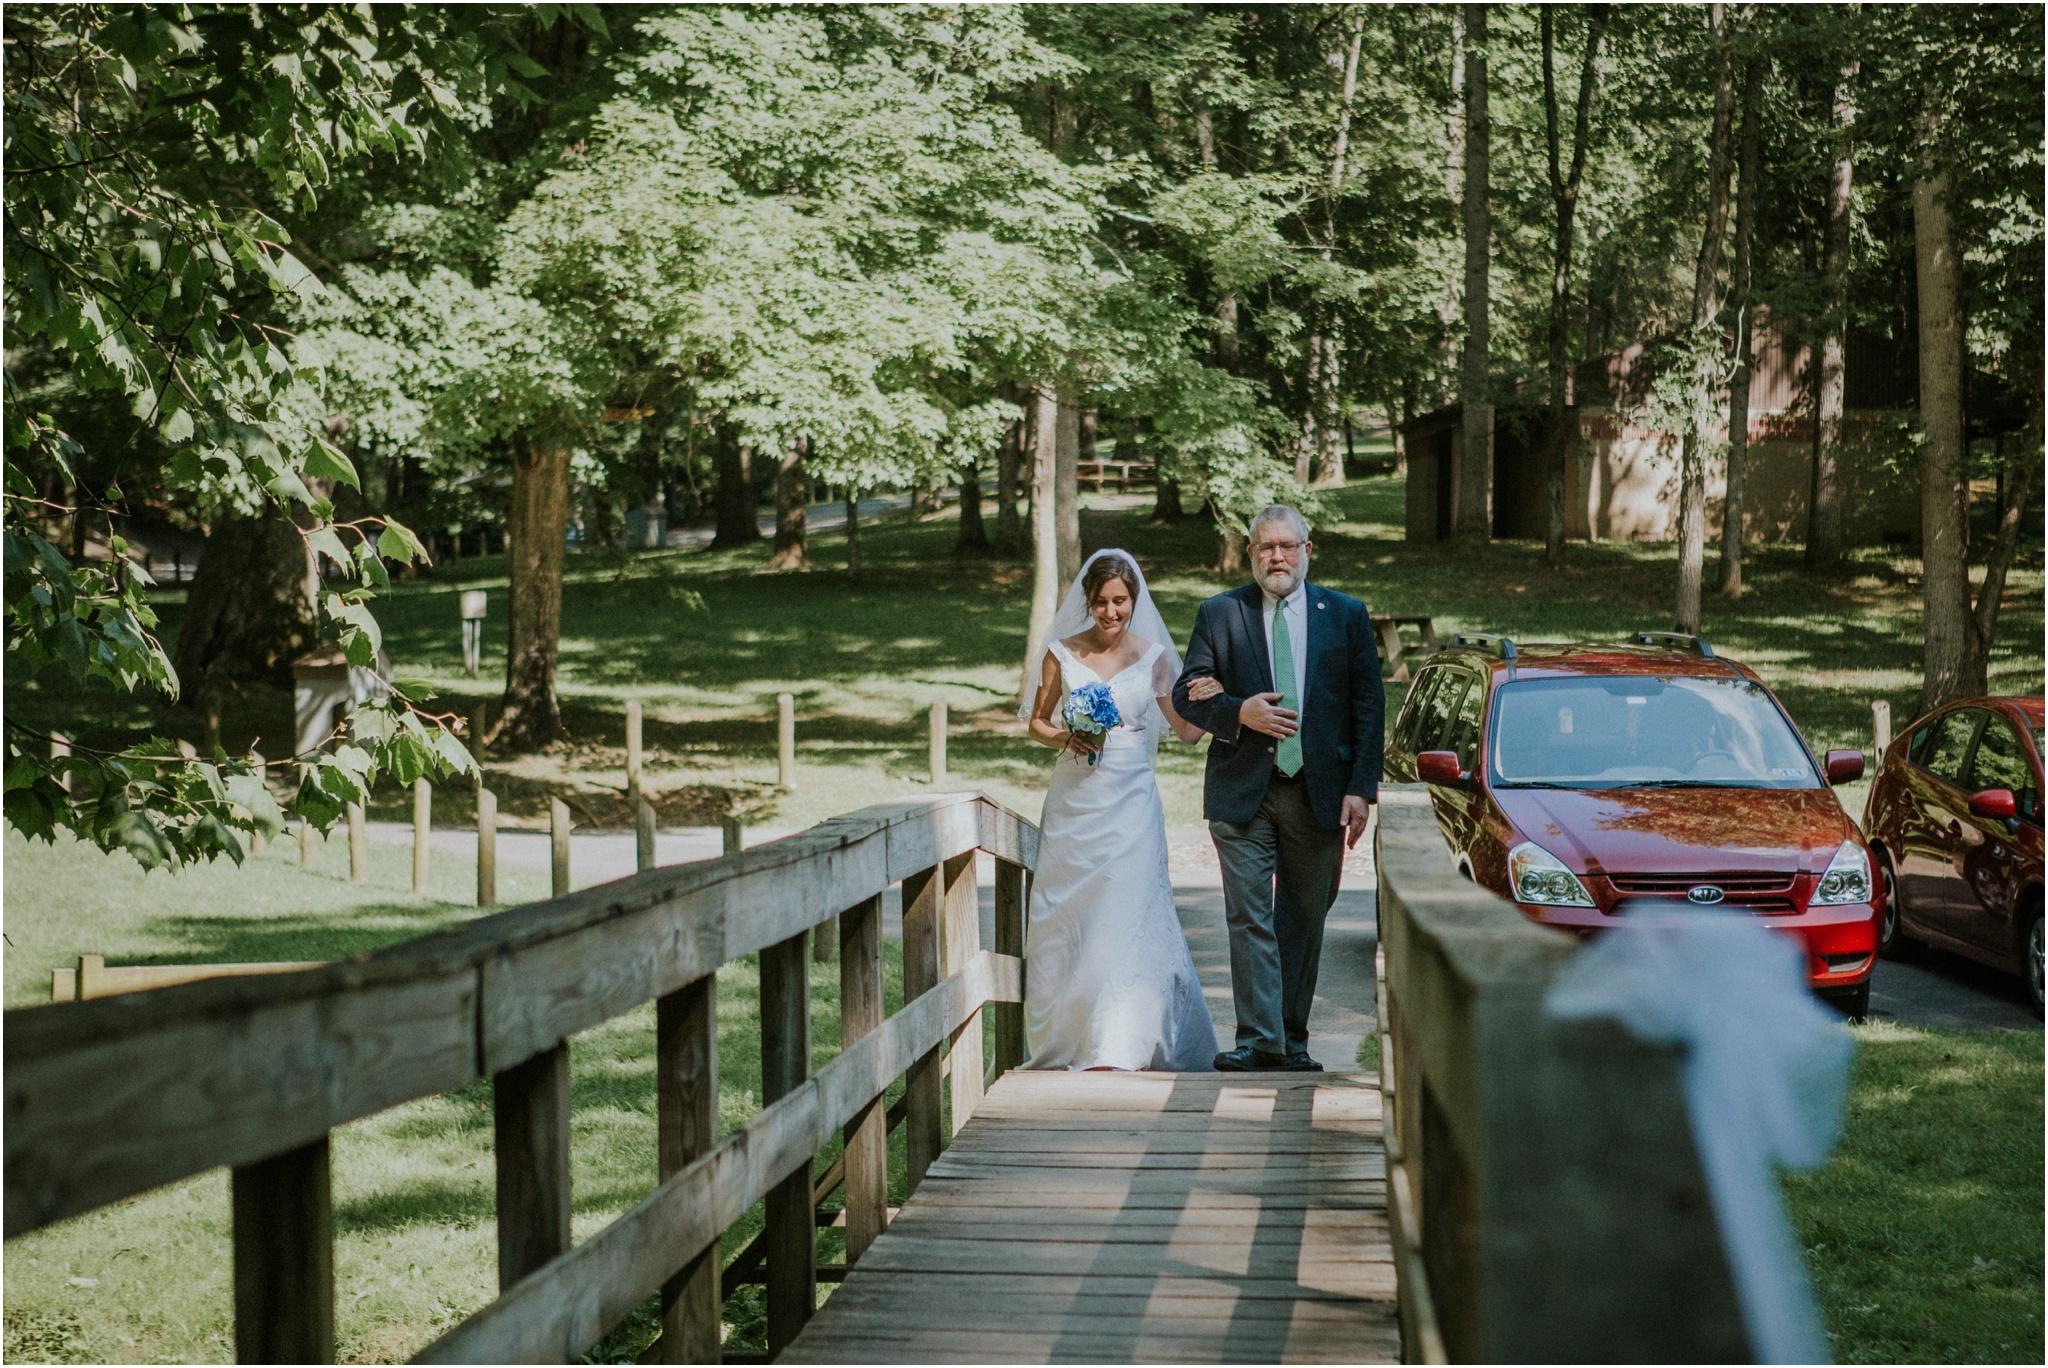 sugar-hollow-park-bristol-virginia-wedding-intimate-woodsy-black-forest-ceremony-adventurous-couple_0013.jpg